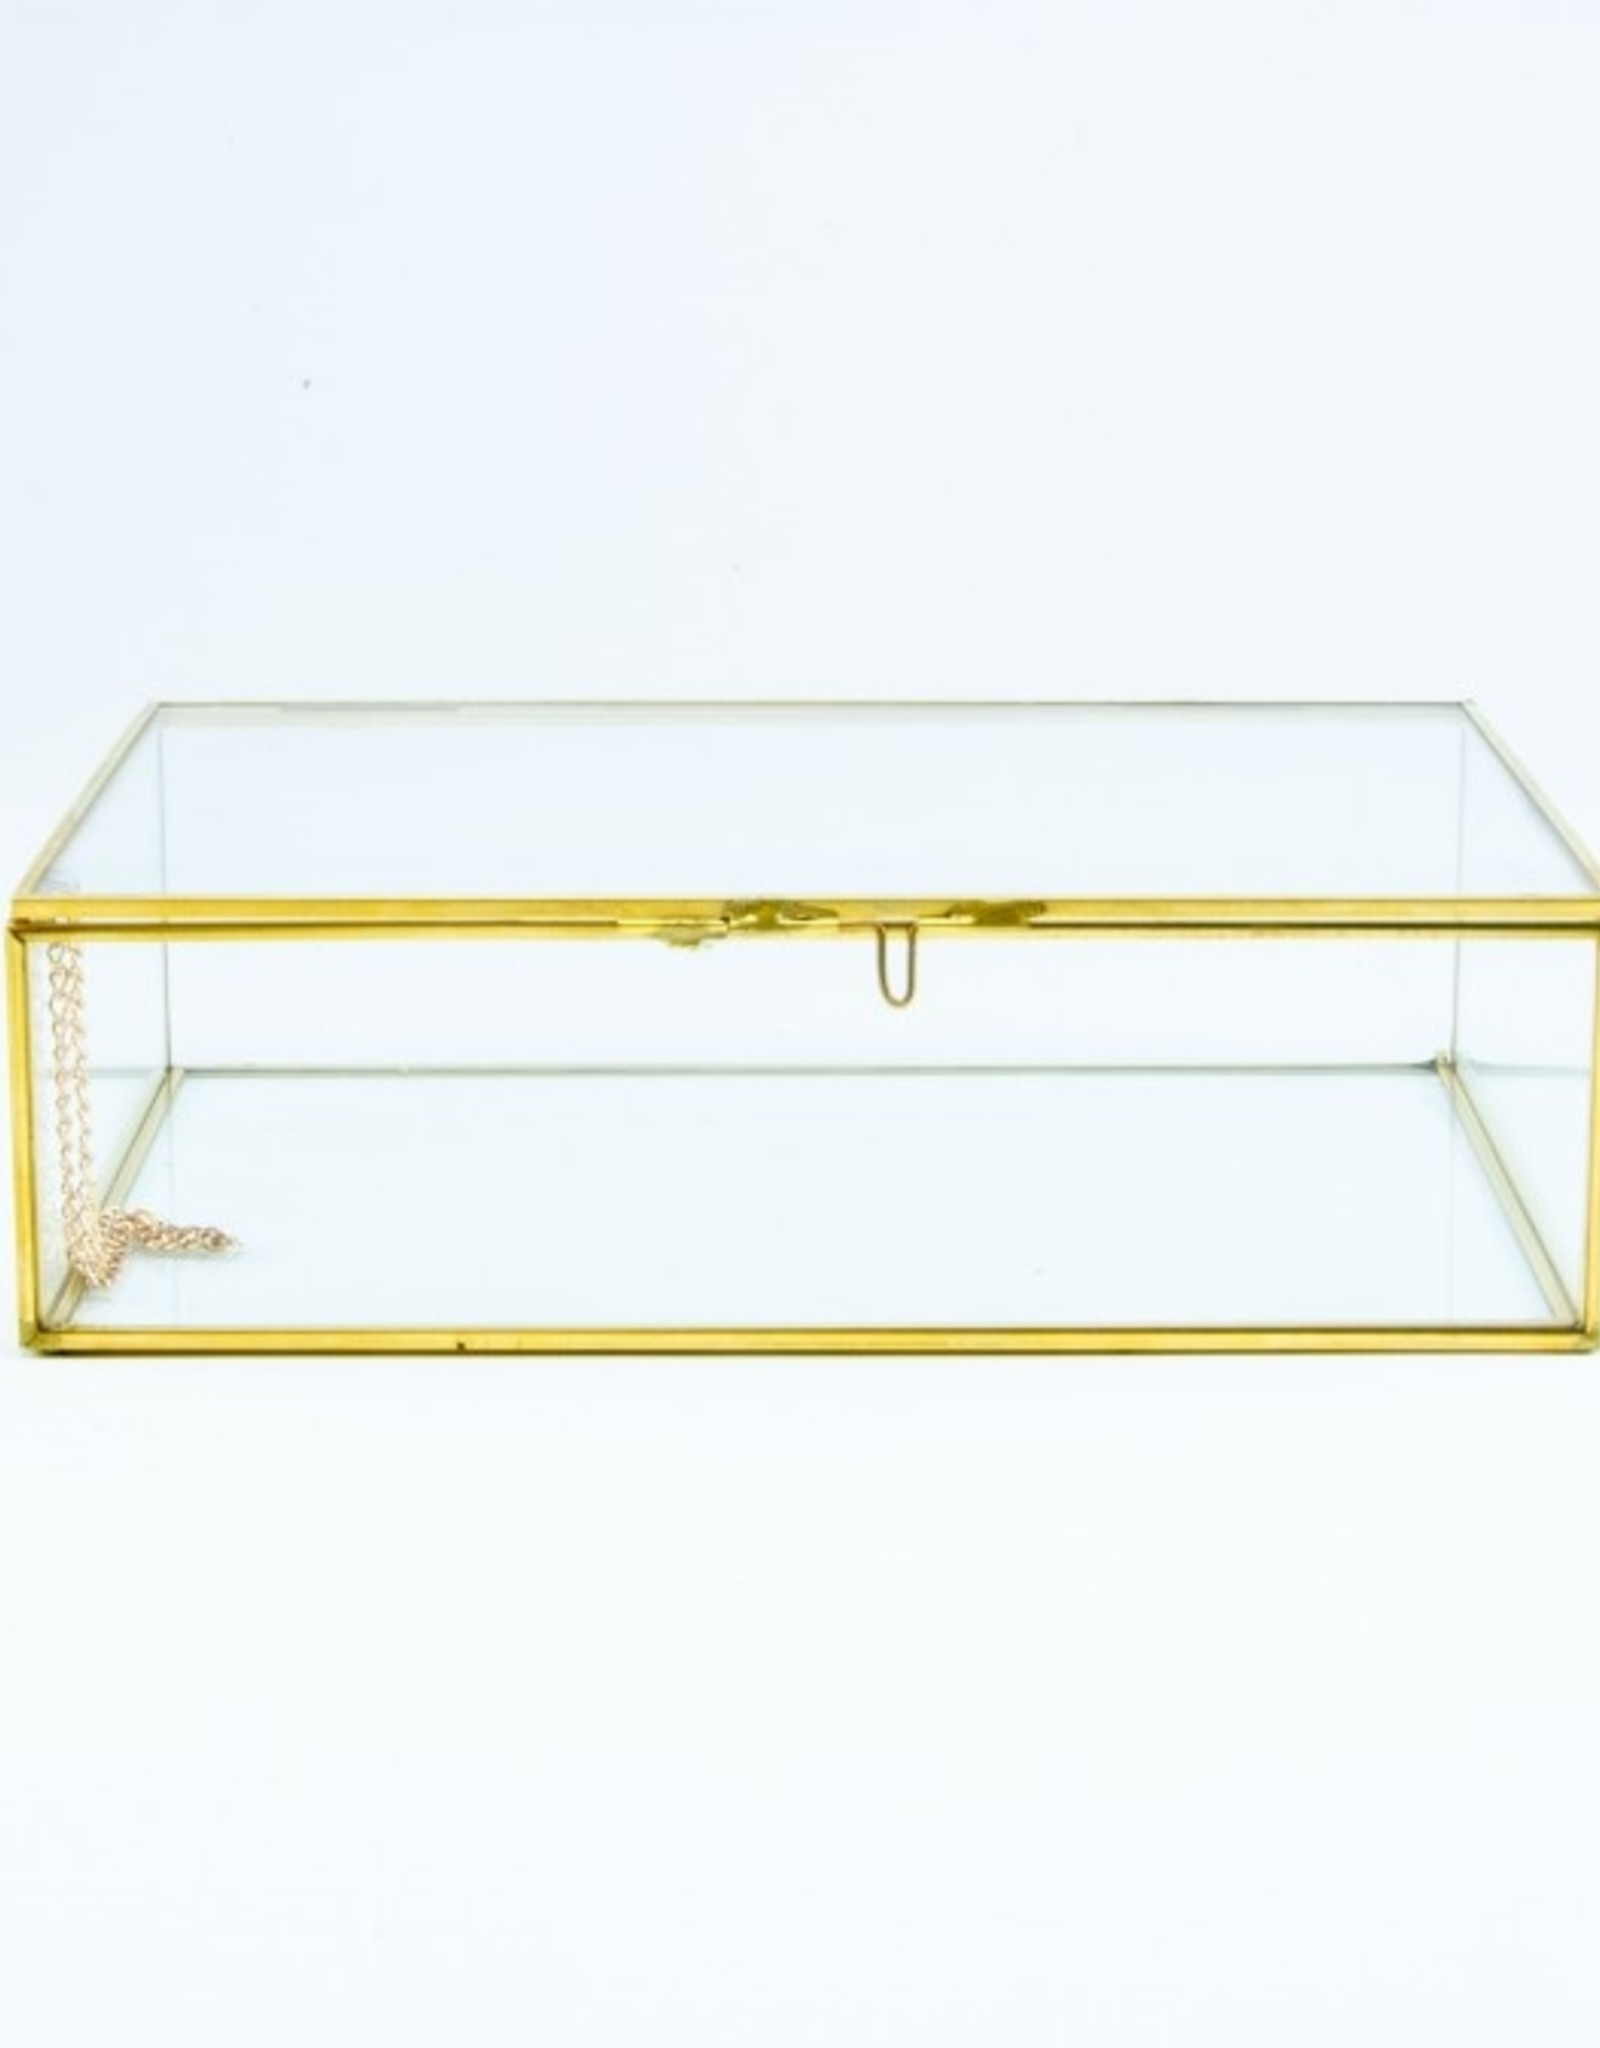 Giftbox rechthoek glas smal 22cm x 15cm x 6.5 cm goud